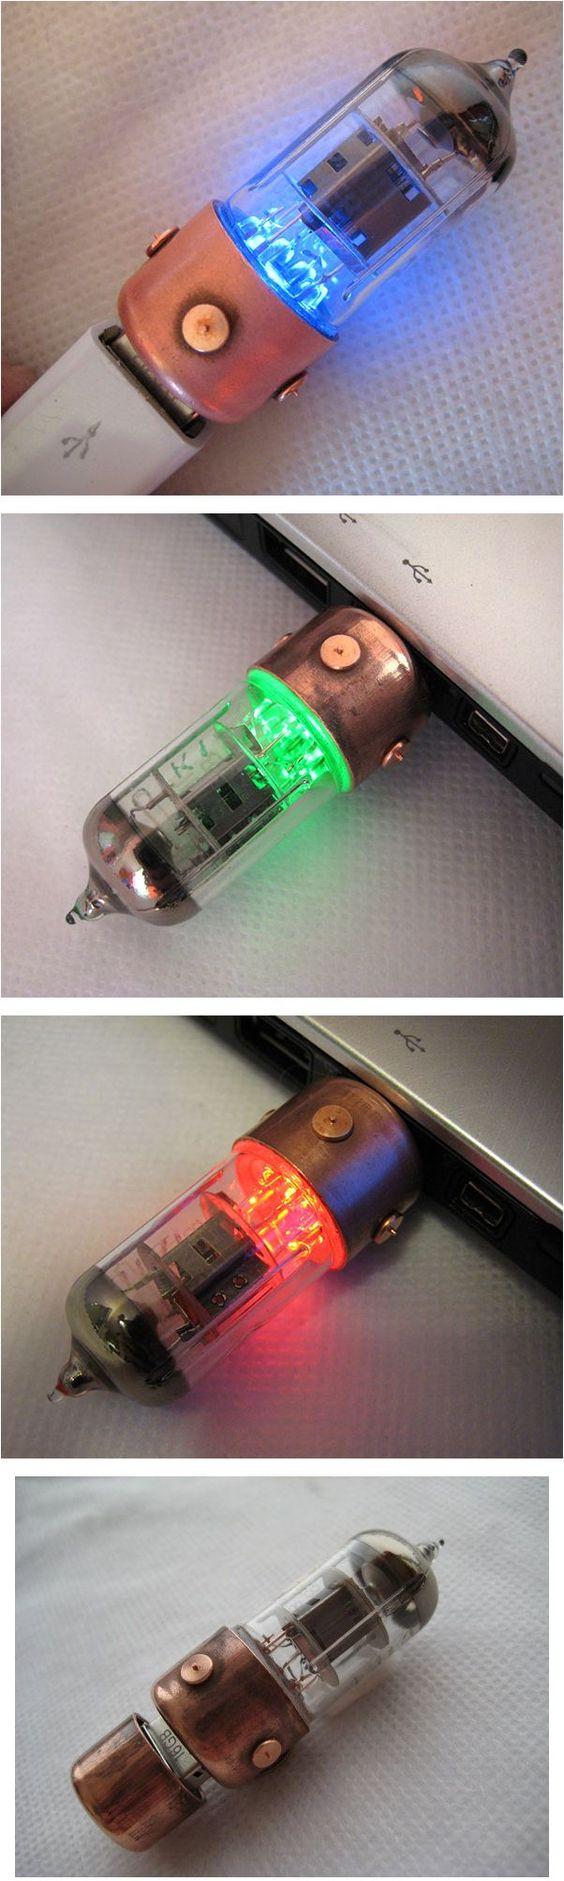 Pentode Radio Tube USB Drive. Love this I soooo want one lol.